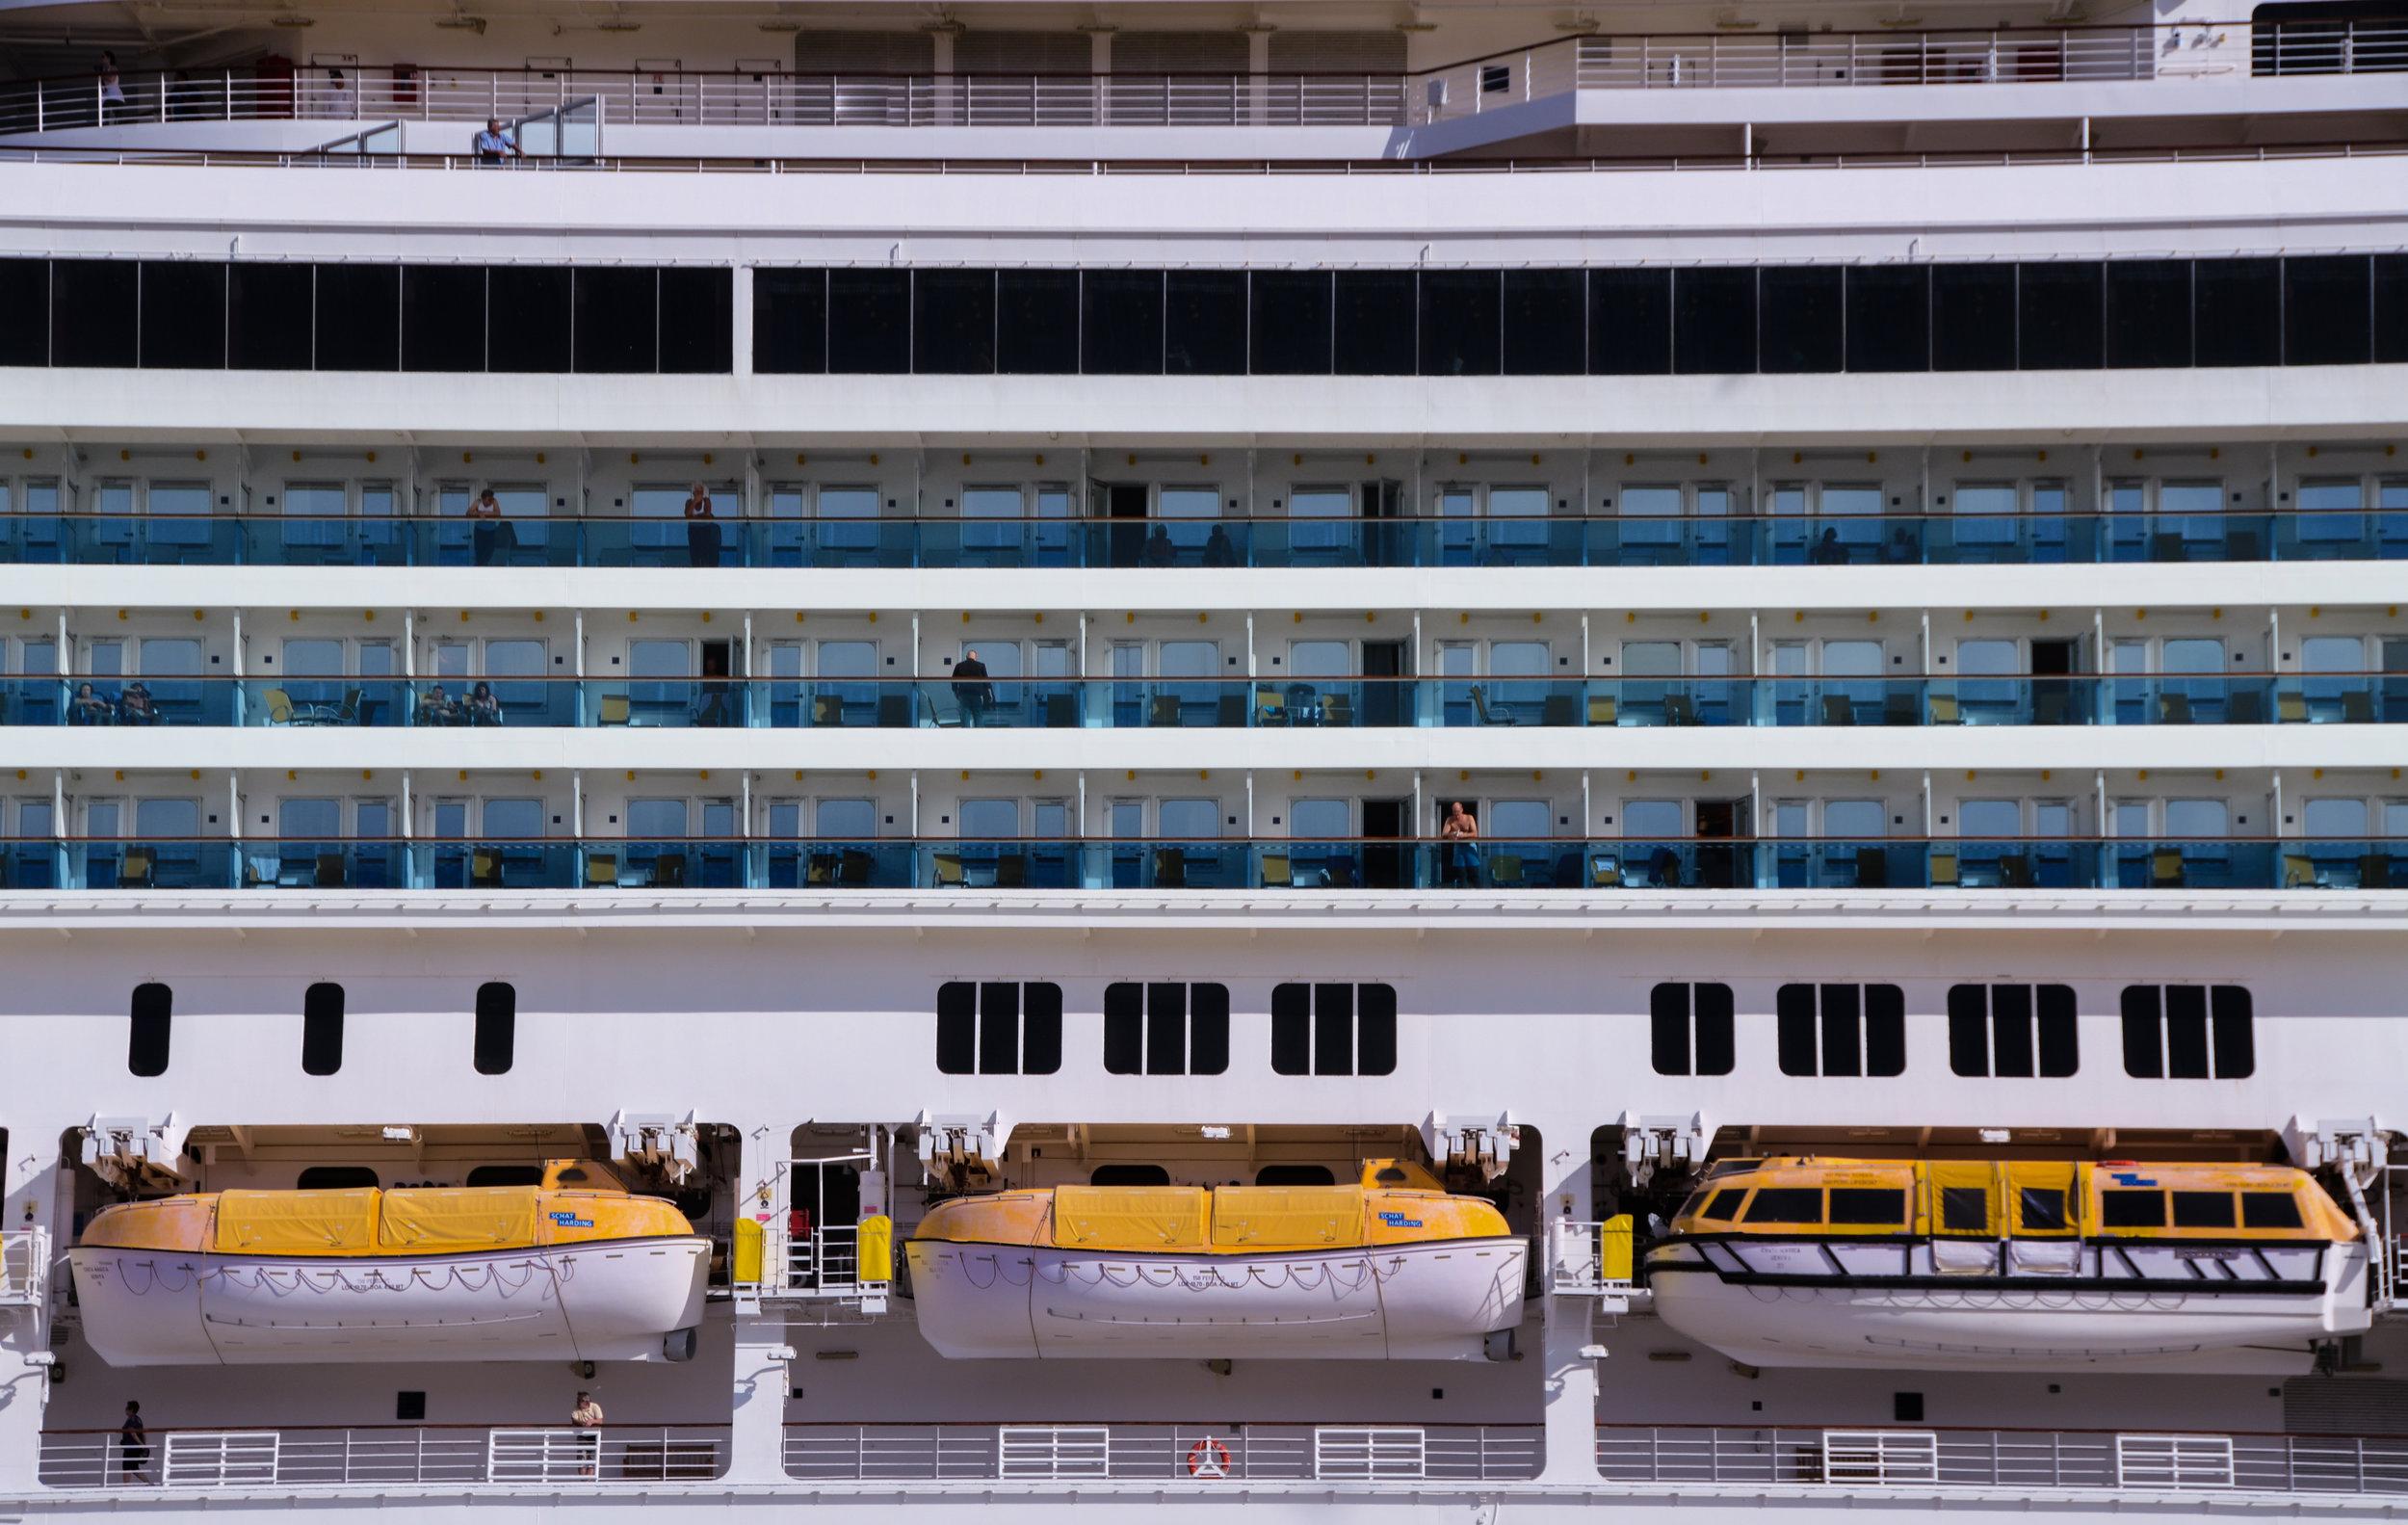 lisbon cruise summer travel